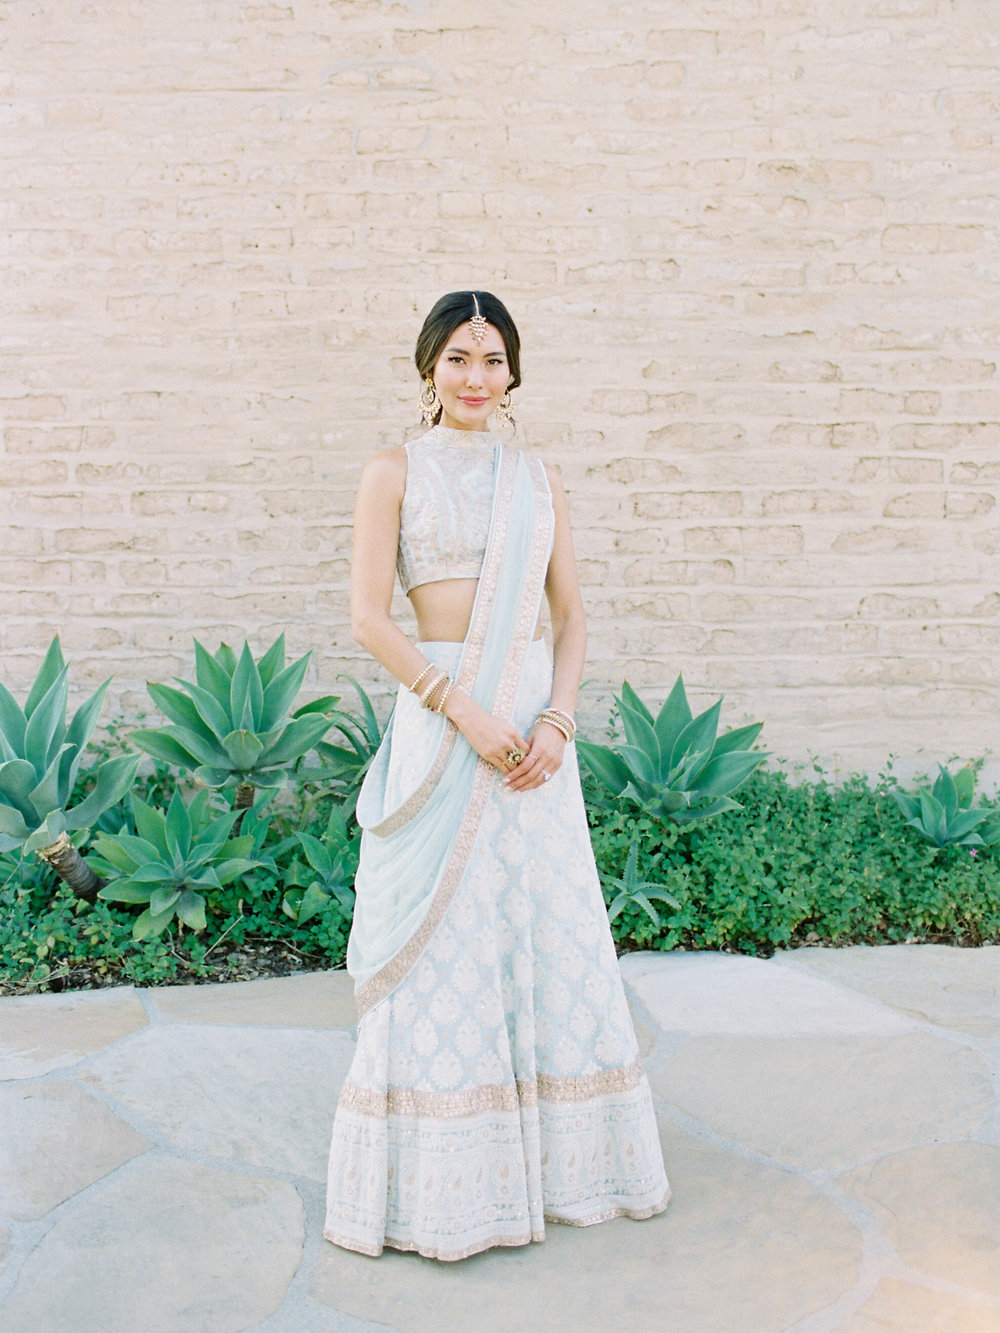 KS-Sangeet-Editorial-82-Jen-Huang-KS-Sangeet-98-Jen-Huang-006913-R2-031.jpg